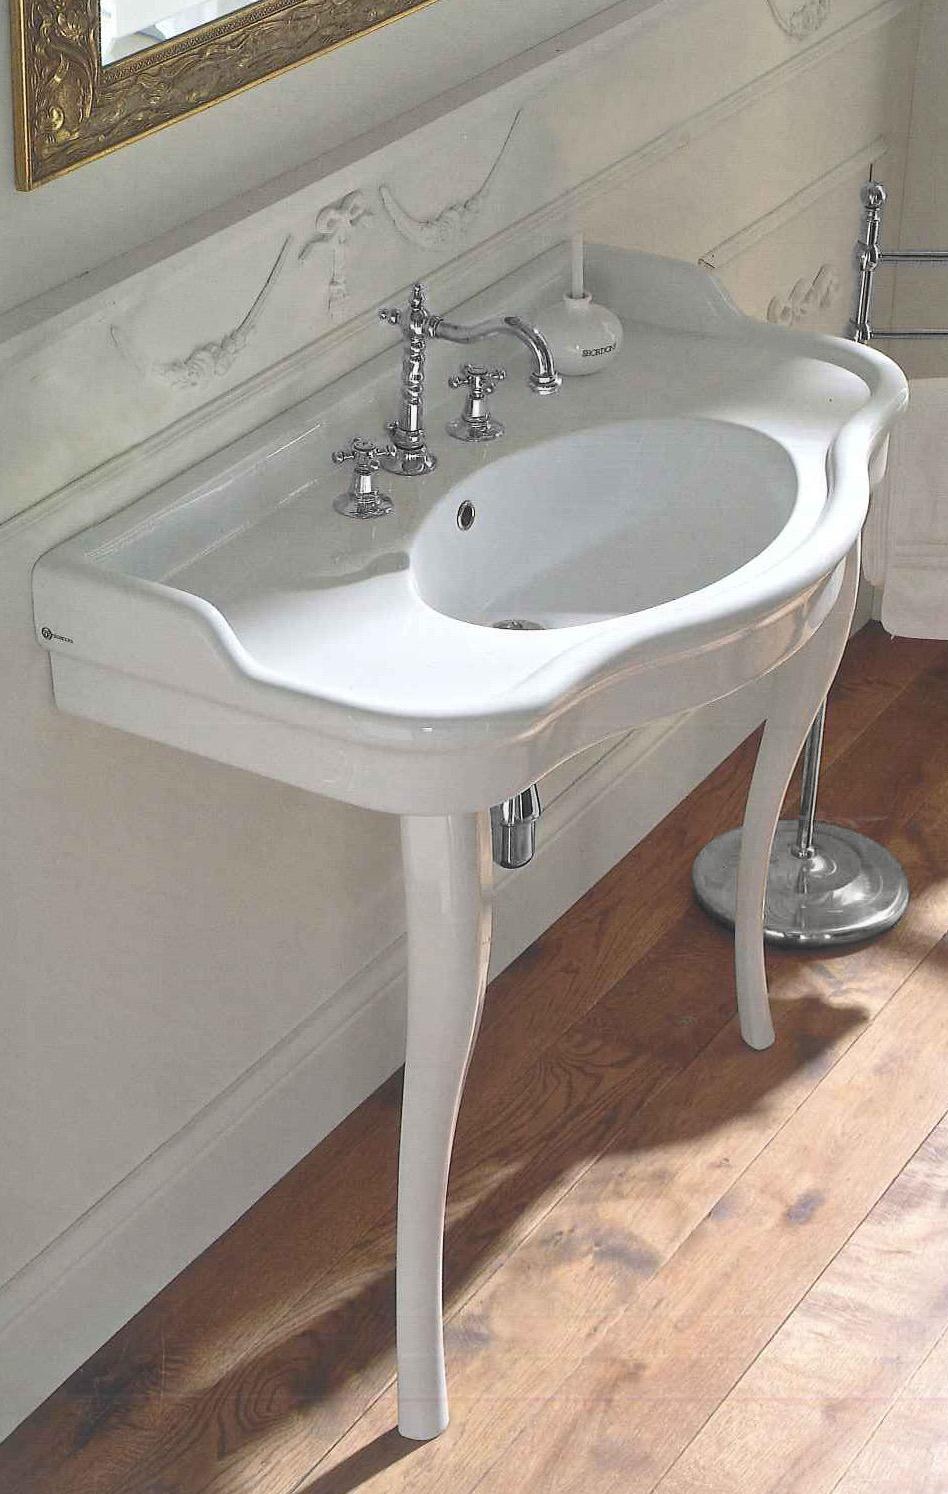 Consolle Bagno Classico - Idee Per La Casa - Syafir.com